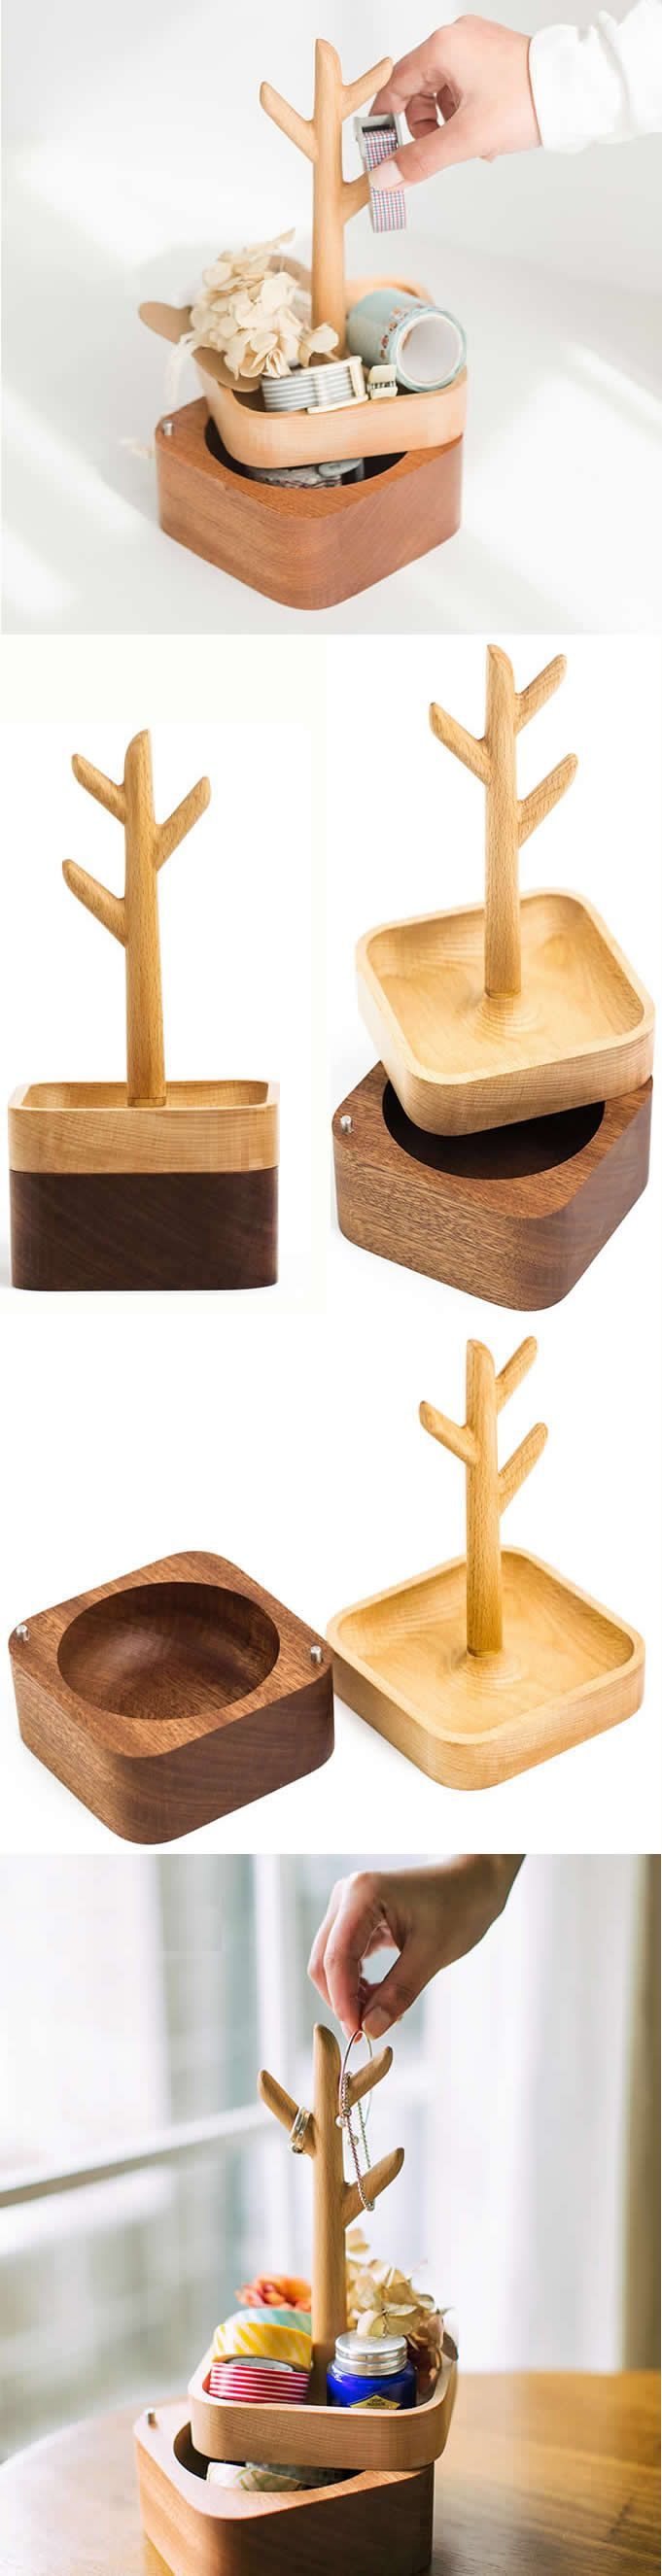 2 Tier Wooden Tree Office Desk Stationery Organizer Jewelry Ornaments display Organizer Box Holder